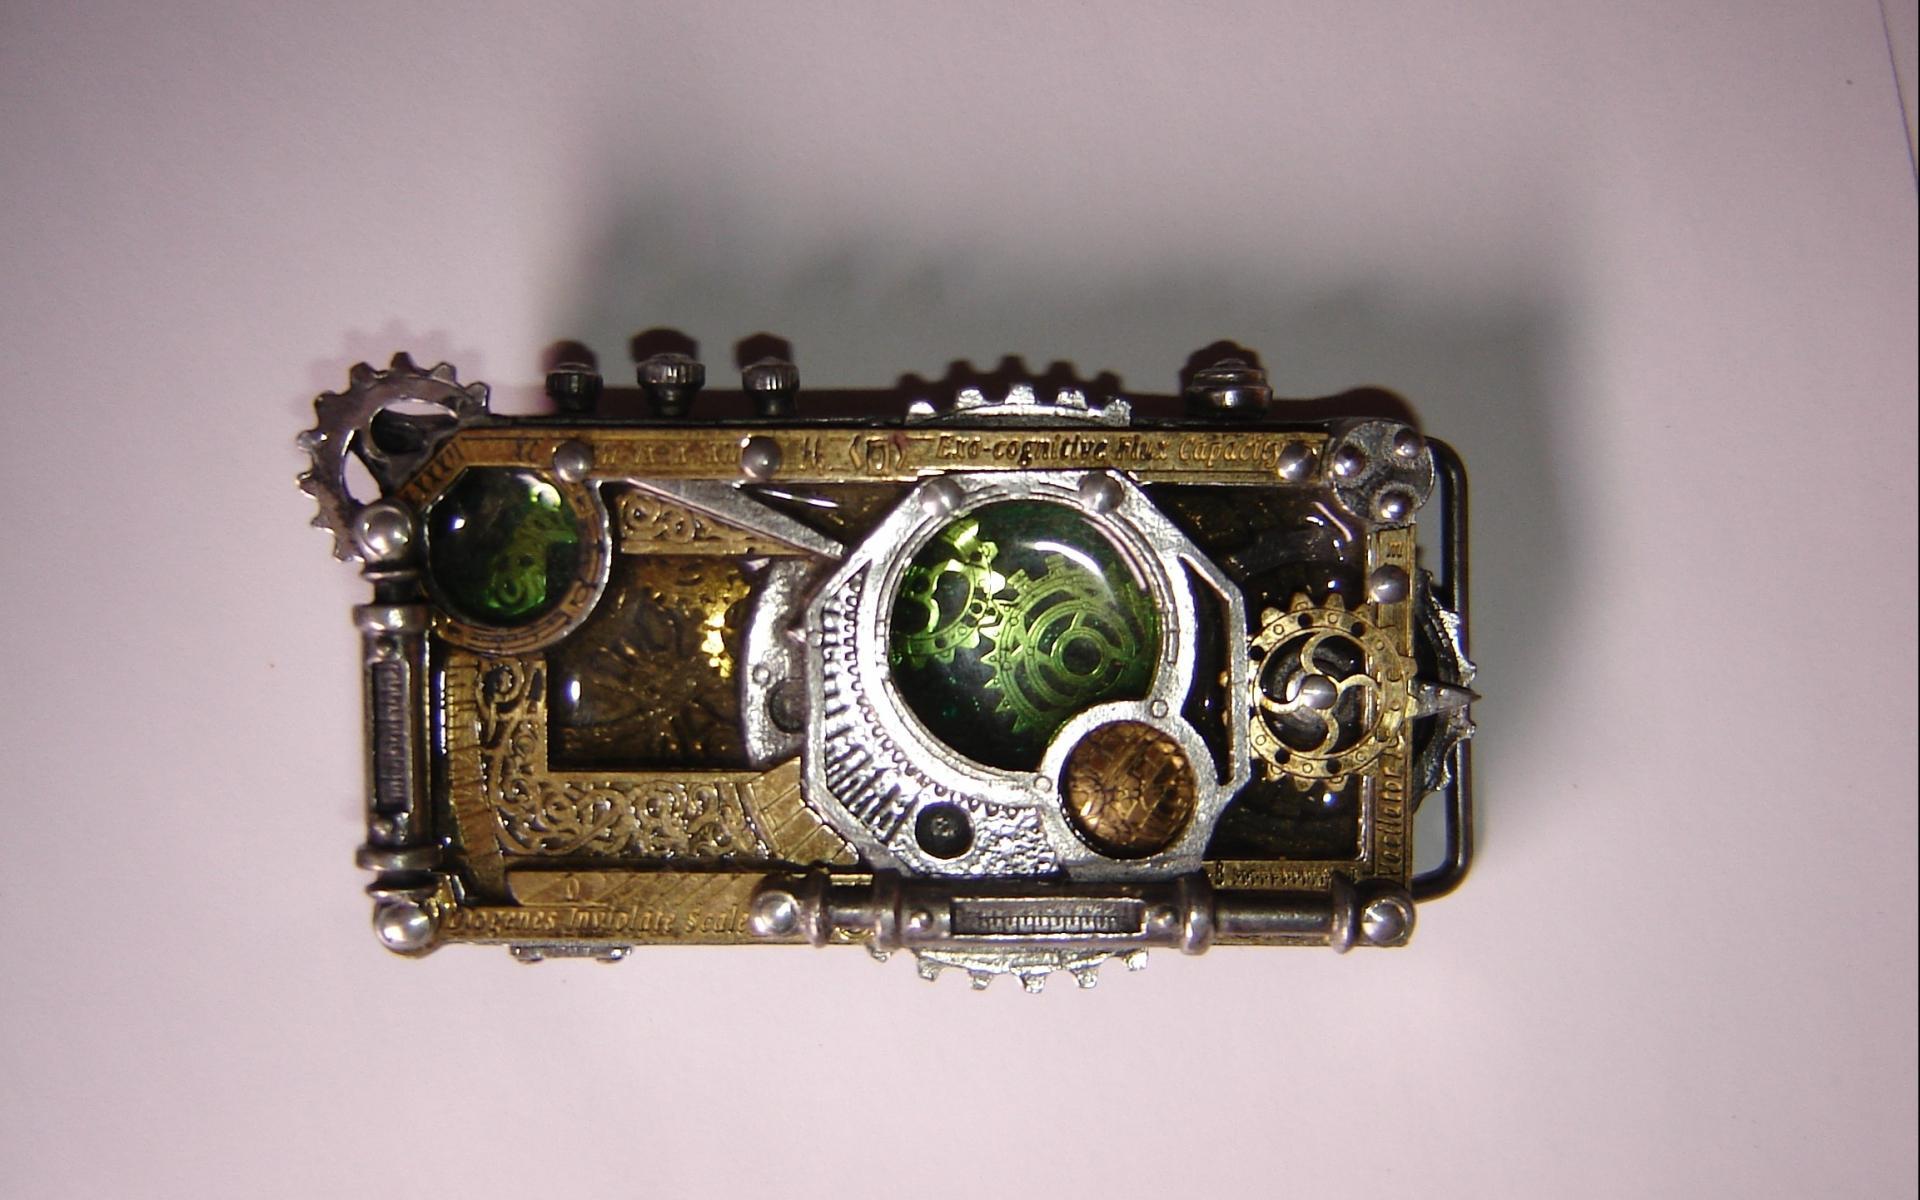 Hd Wallpaper Girl Bike Hd Steampunk Mechanical Tech Camera Gears Lens Desktop